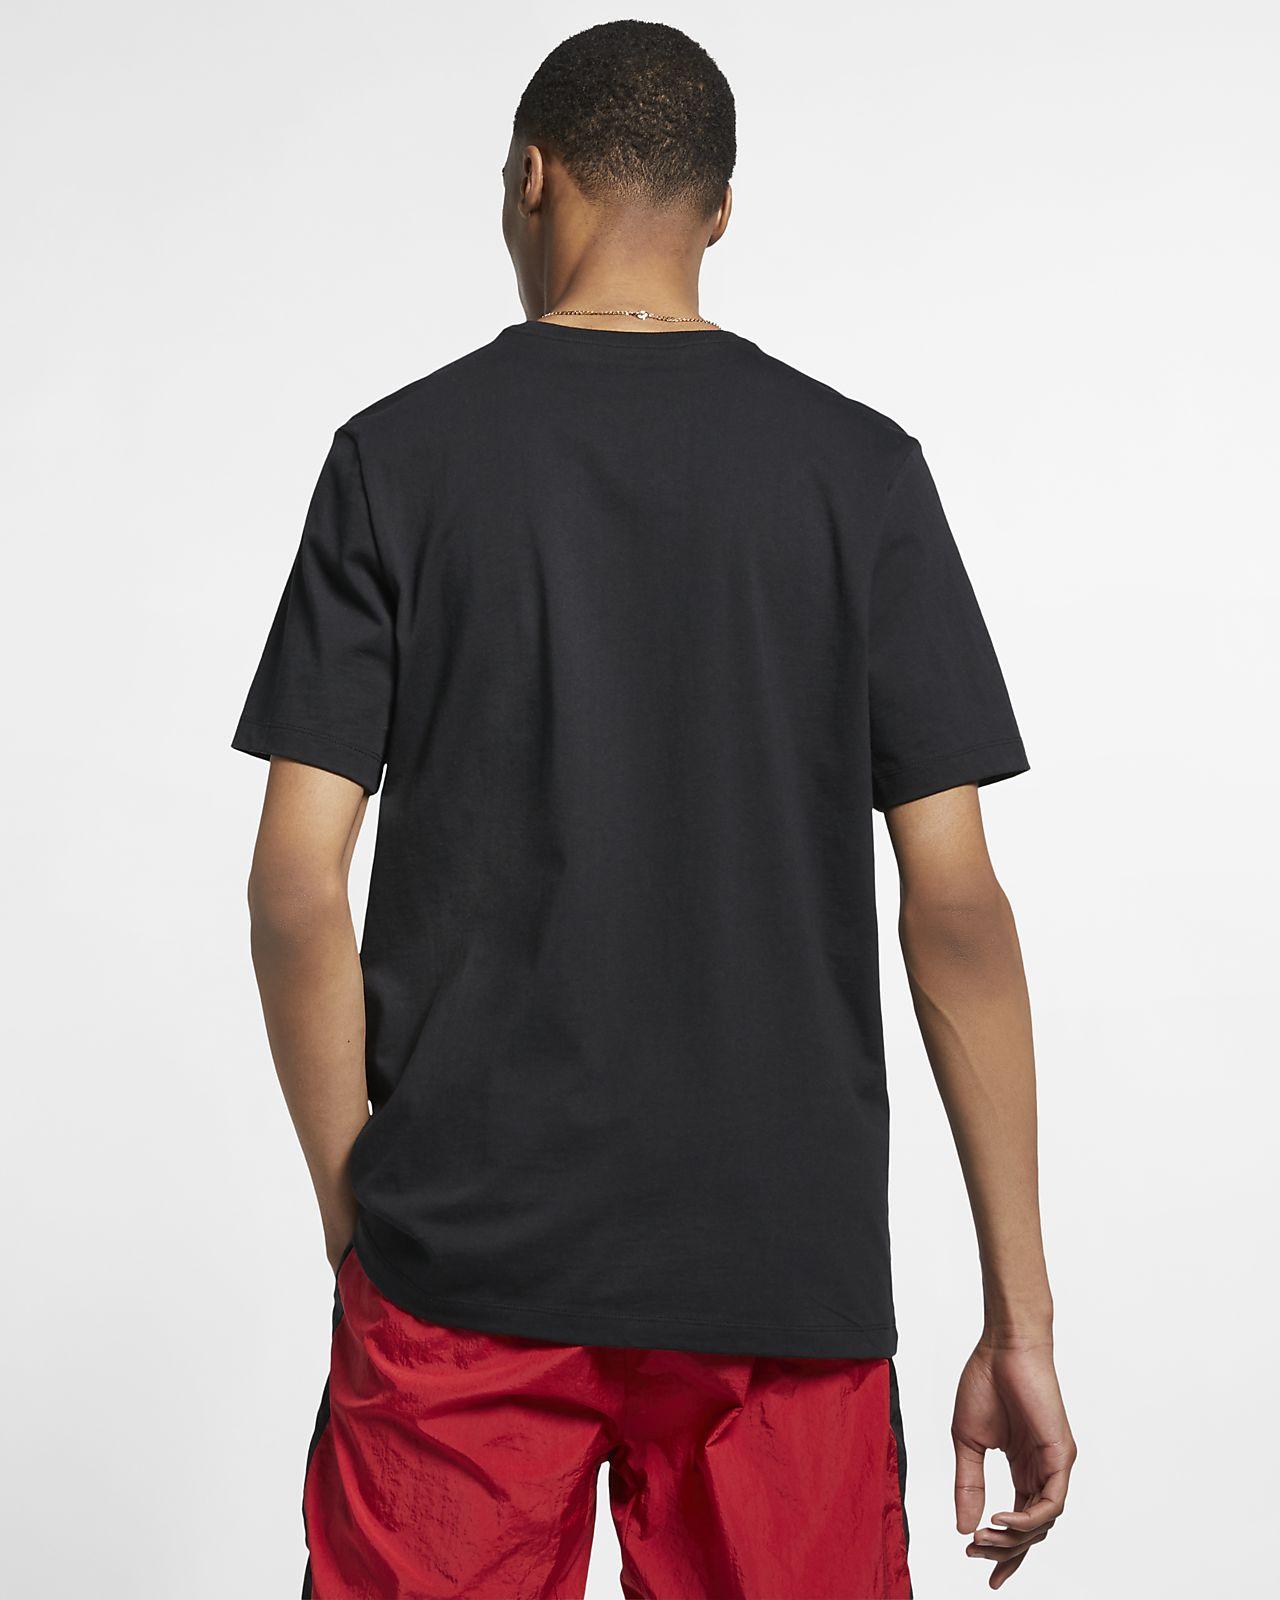 bc04d9207002 Jordan Legacy AJ4 Woven Labels Men s T-Shirt. Nike.com ID